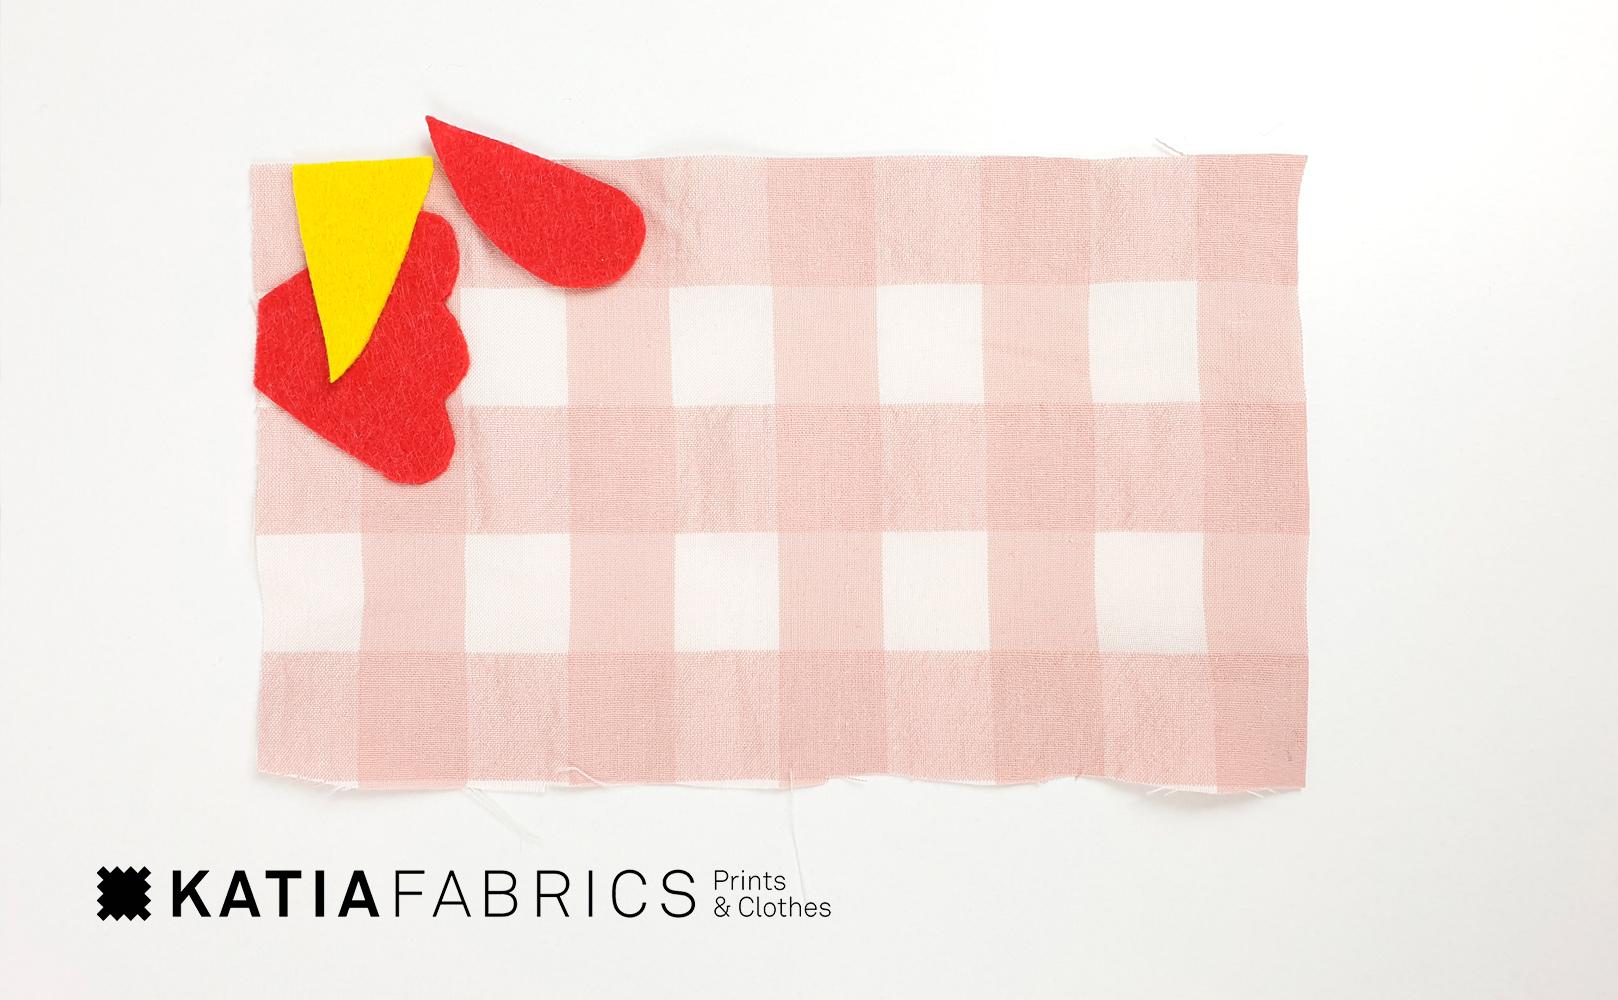 gallinas corte de la tela